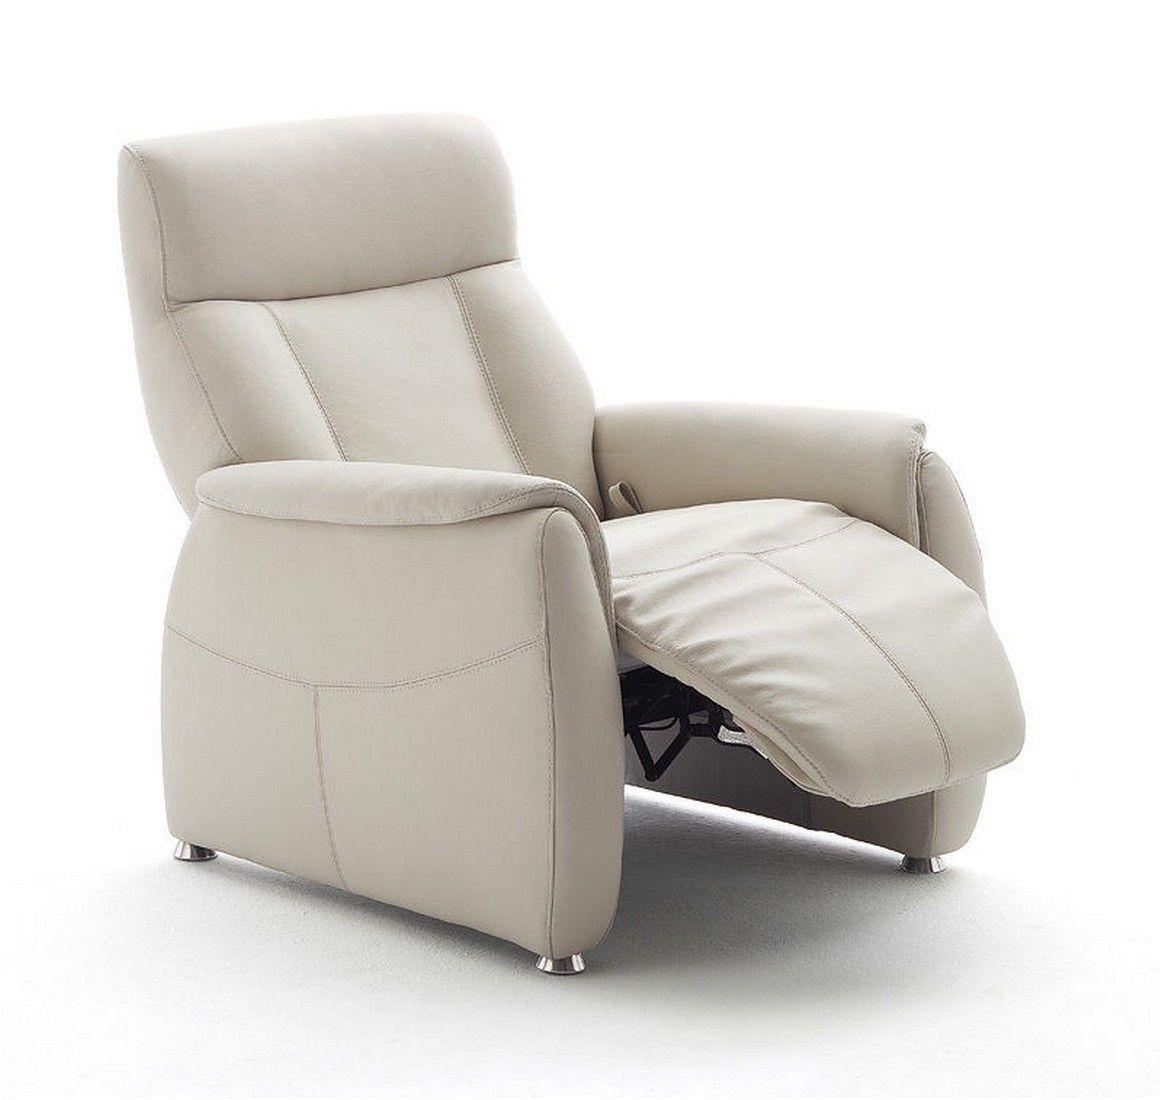 Full Size of Ikea Relaxsessel Strandmon Sessel Elektrisch Leder Muren Garten Mit Hocker Grau Gebraucht Kinder Sofa Schlaffunktion Modulküche Aldi Miniküche Betten Bei Wohnzimmer Ikea Relaxsessel